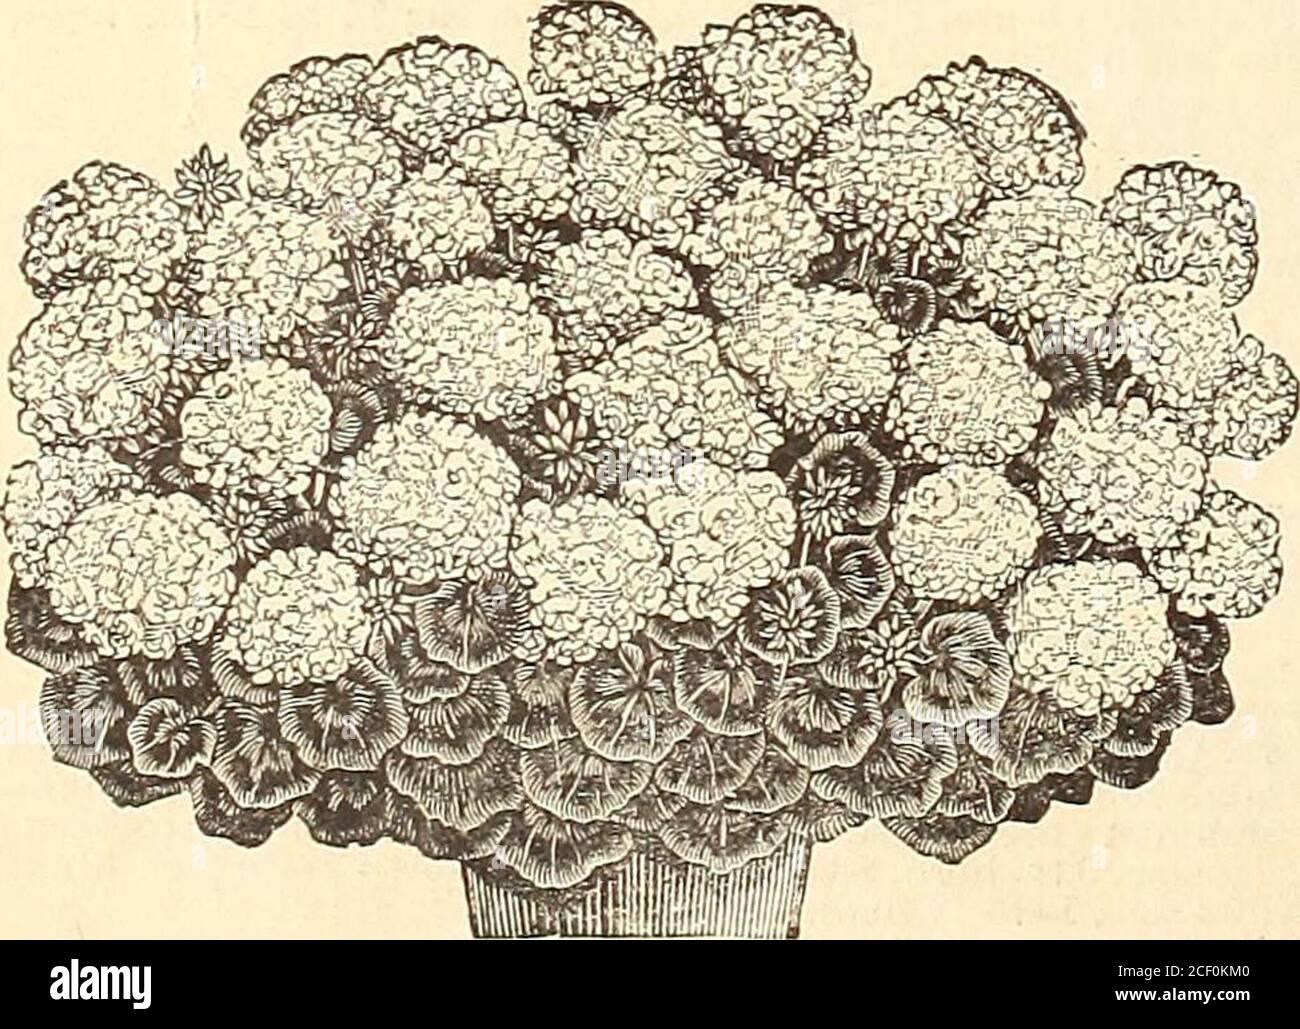 . Wm. Elliott & Sons : 1893. FANCY CALADIUMS.. GERANIUM, WHITE SWAN. SINGLE FUCHSIAS. Annie Earle. Carmine corolla ; waxy white sepals. Benjamin Pearson. Crimson and purple corolla; sepals rosy red. Black Prince. Tube and sepals waxy carmine. Beacon. Corolla a deep carmine ; sepals scarlet. Constancy. Corolla single, rich carmine ; sepals white ; flowers large ; a very beautiful variety.Dr. Topinard. Sepals large cerise red; large open single corolla, pure white marked rose.Earl of Beaconsfield. Deep orange corolla ; extra large flower.Ernest Renan. Corolla carmine ; sepals white.Little Alice. Stock Photo